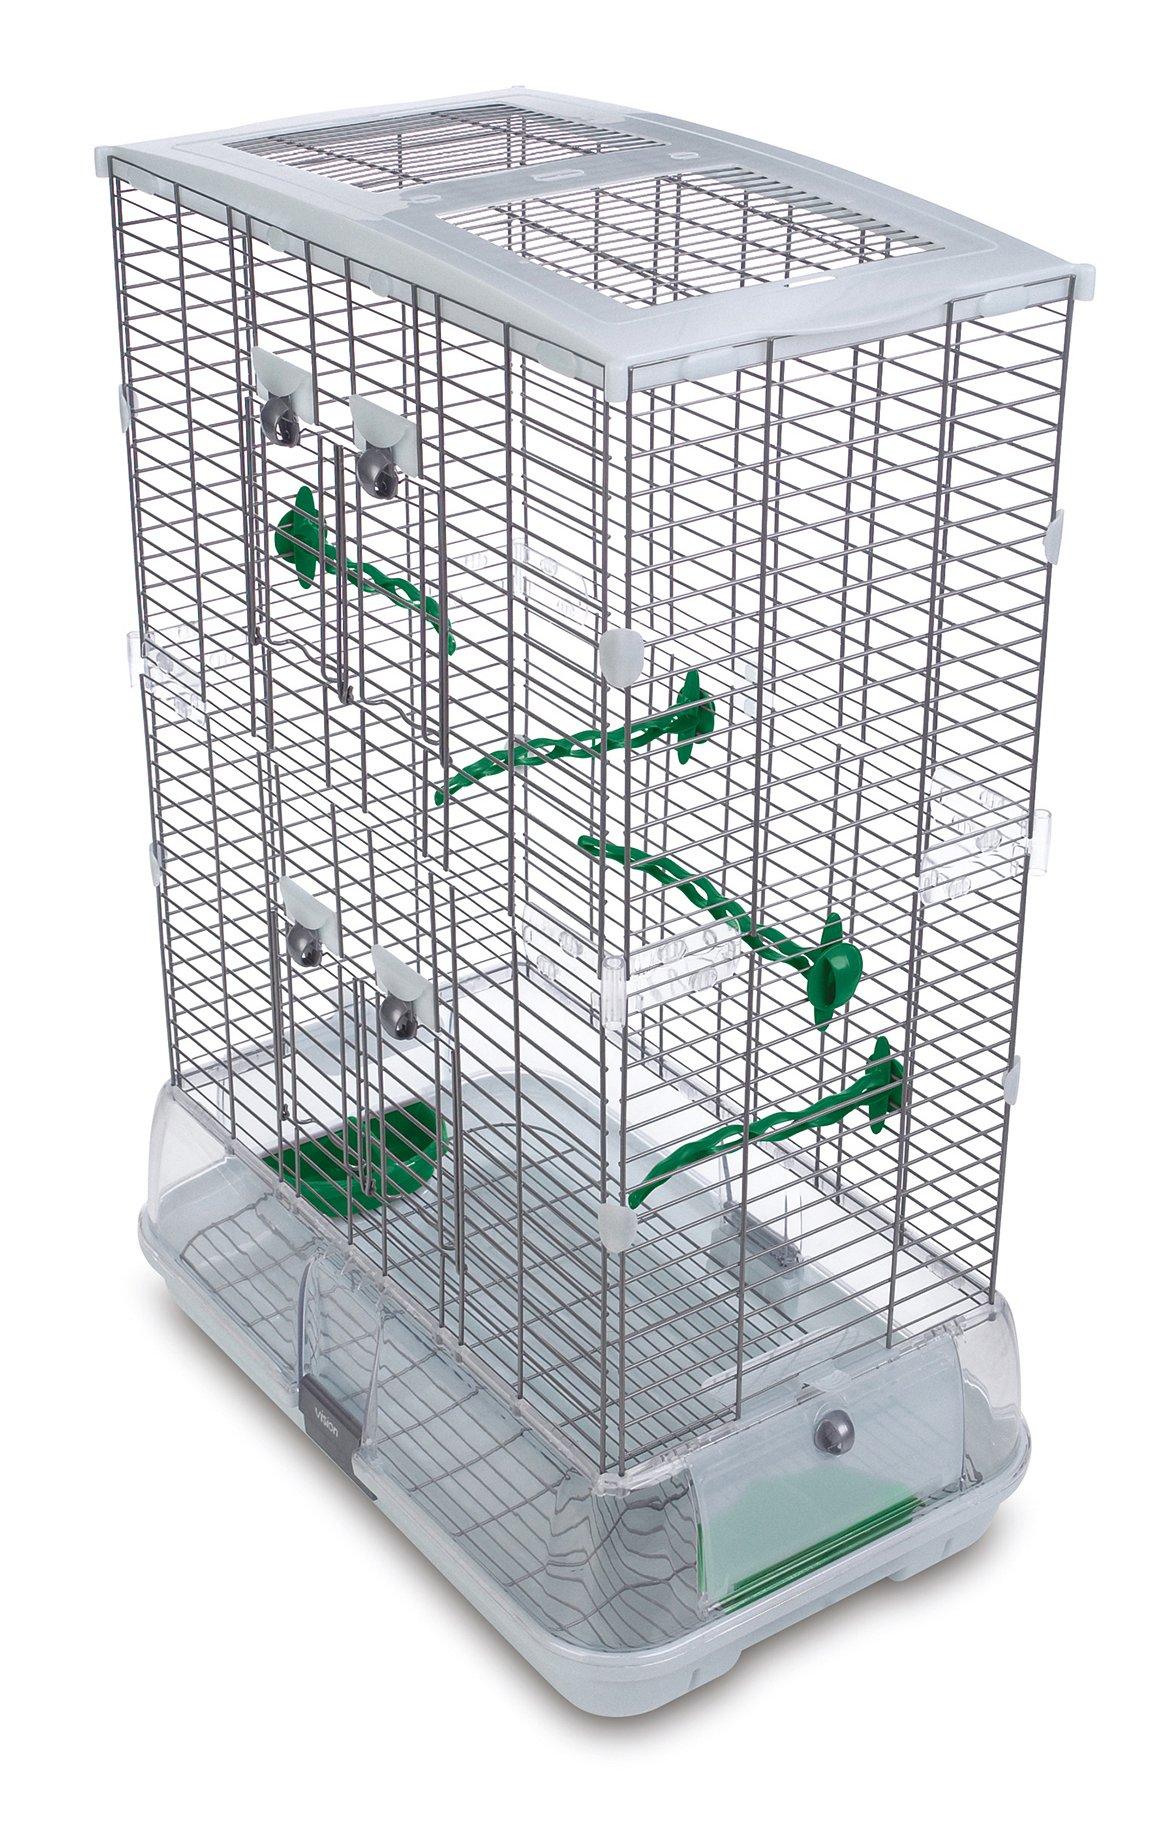 Vision Bird Cage Model M12 - Medium by Vision